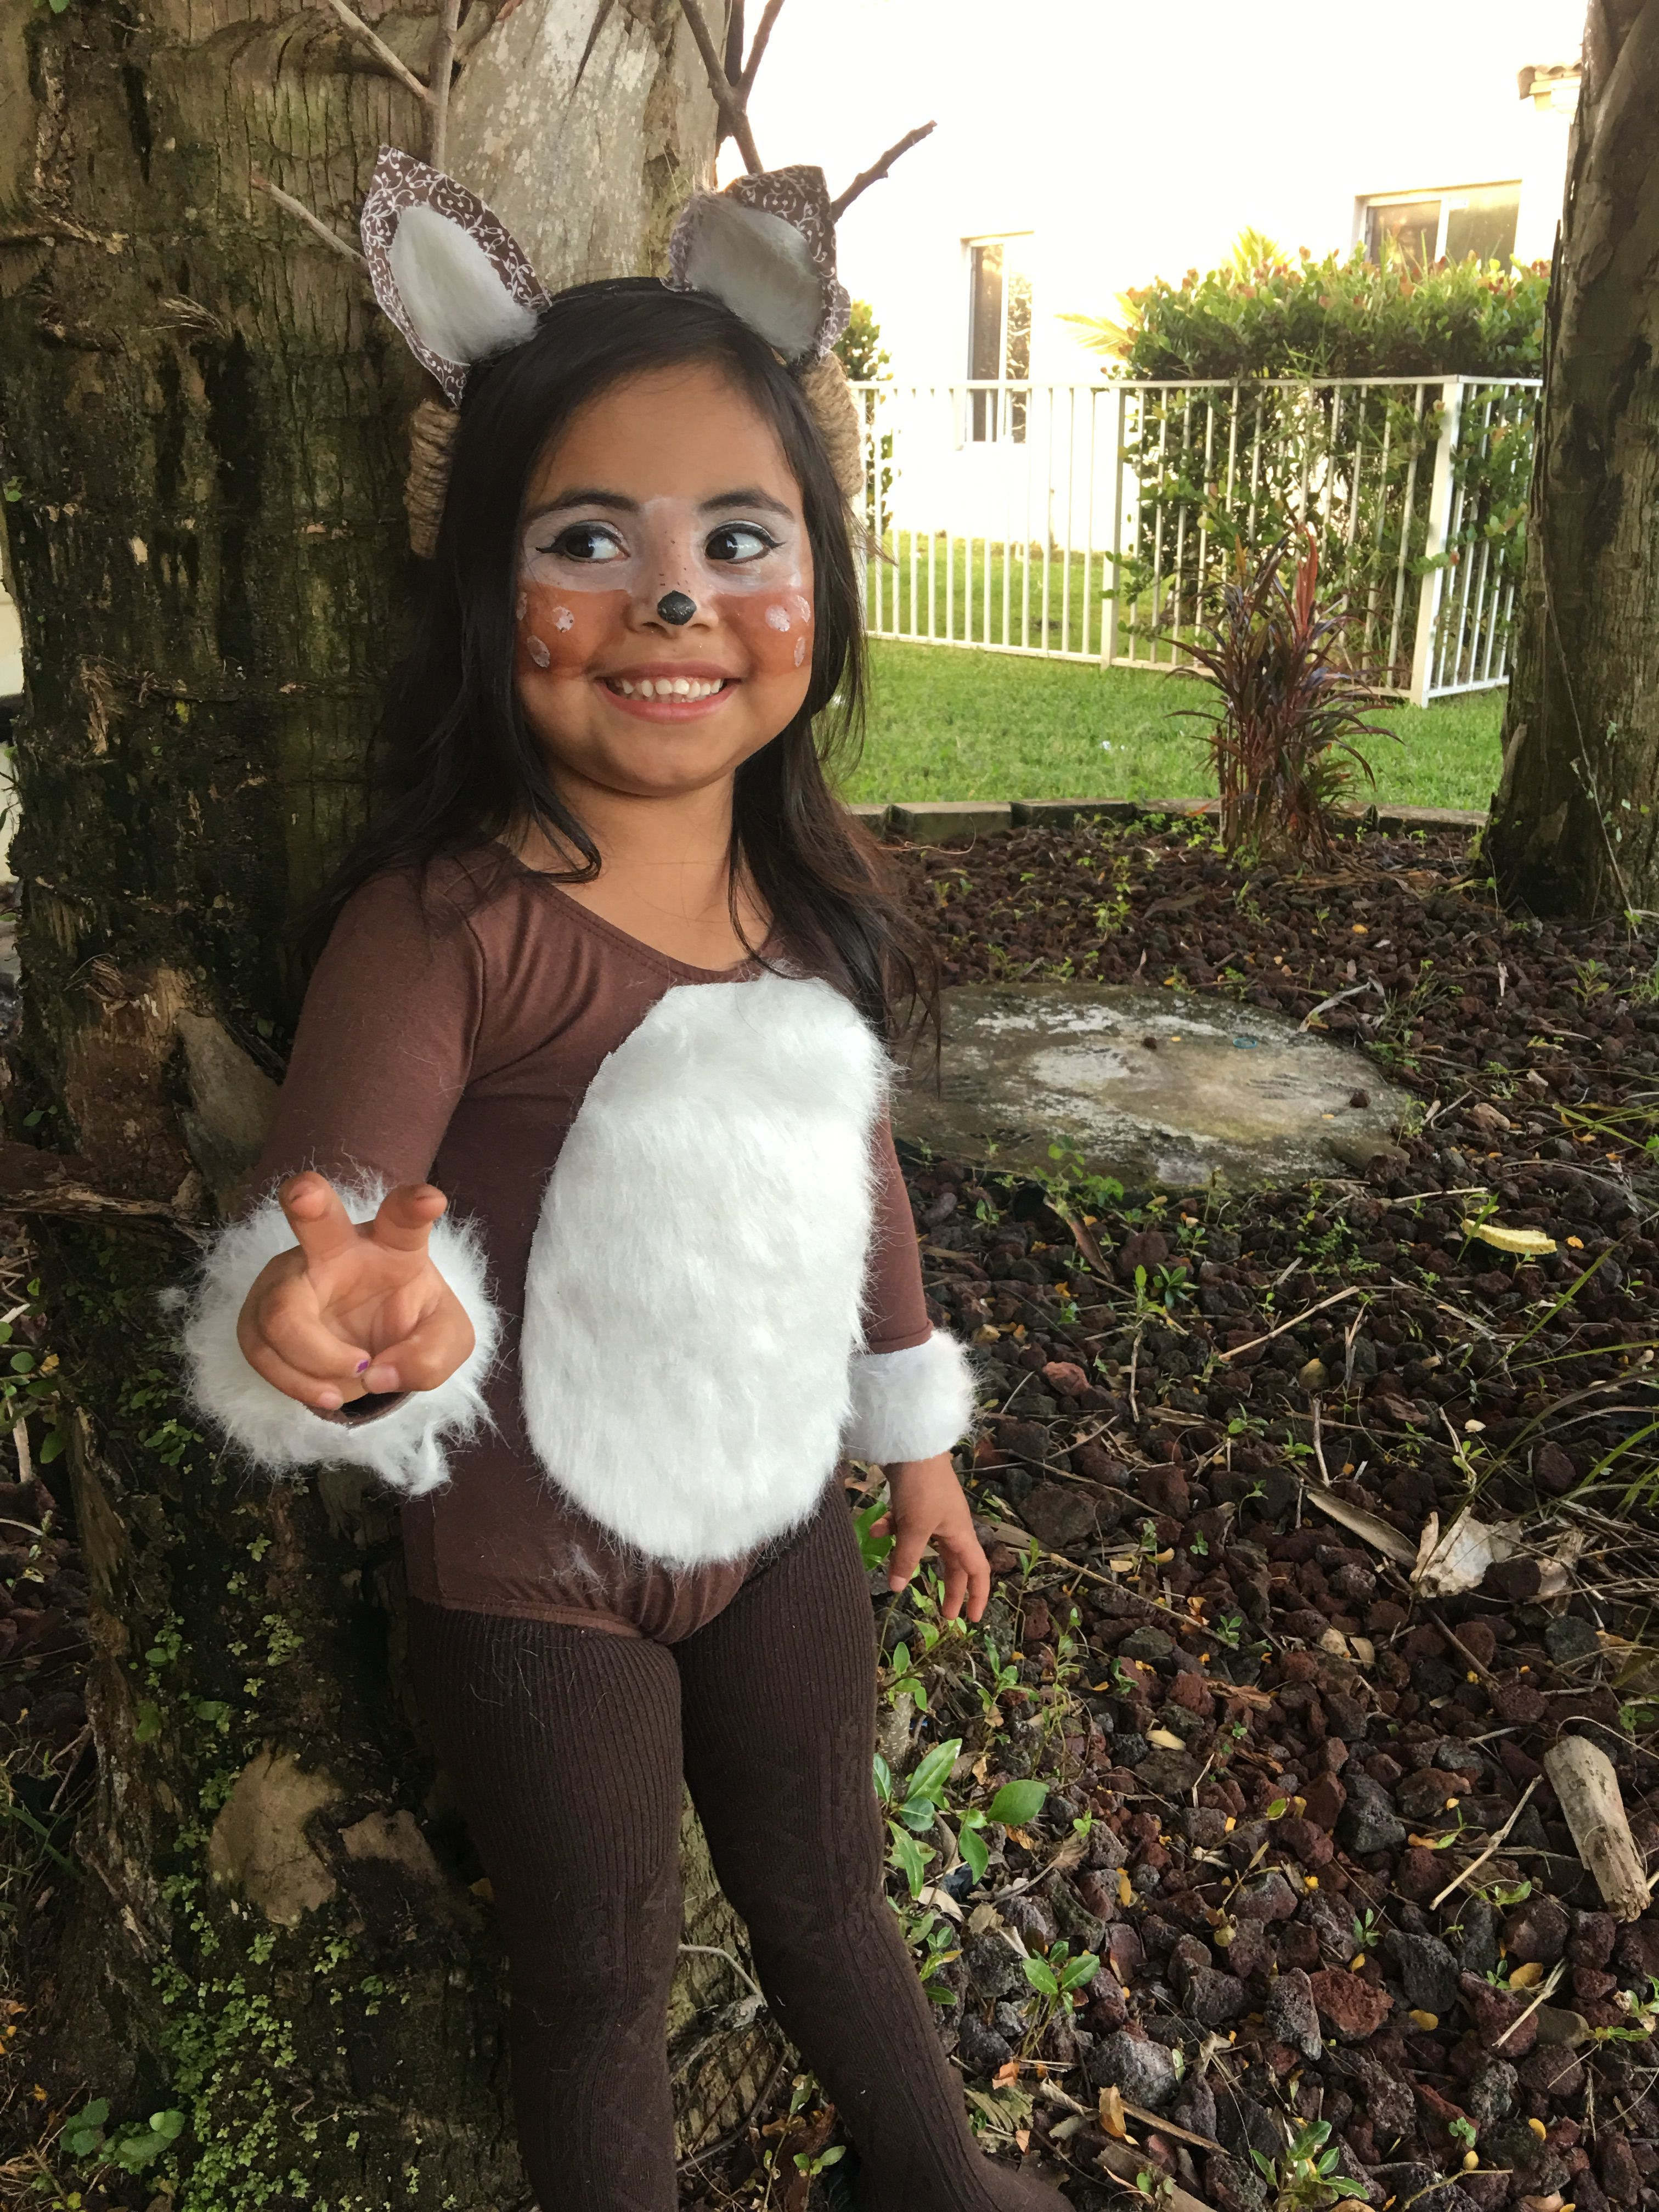 Reindeer Doe Costume Halloween DIY … Reindeer costume